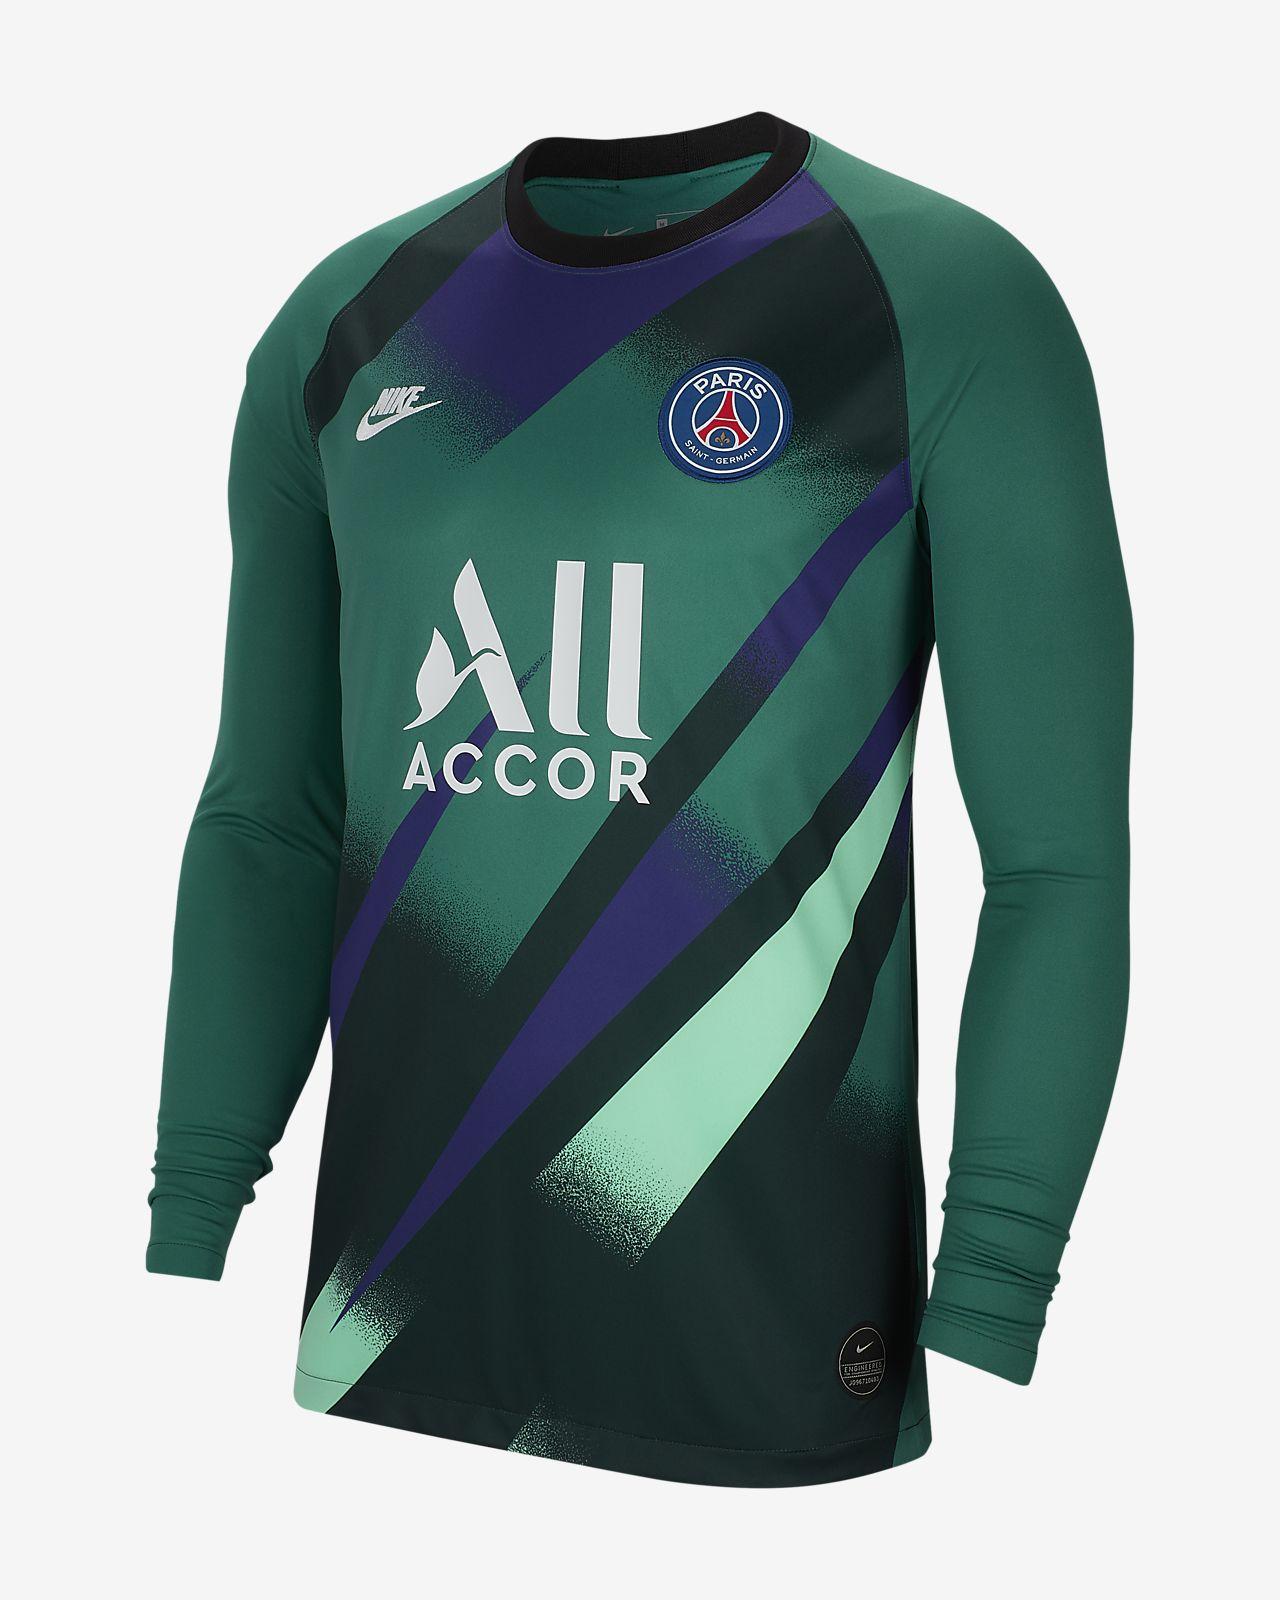 Maillot de football Paris Saint-Germain 2019/20 Stadium Goalkeeper Third pour Homme